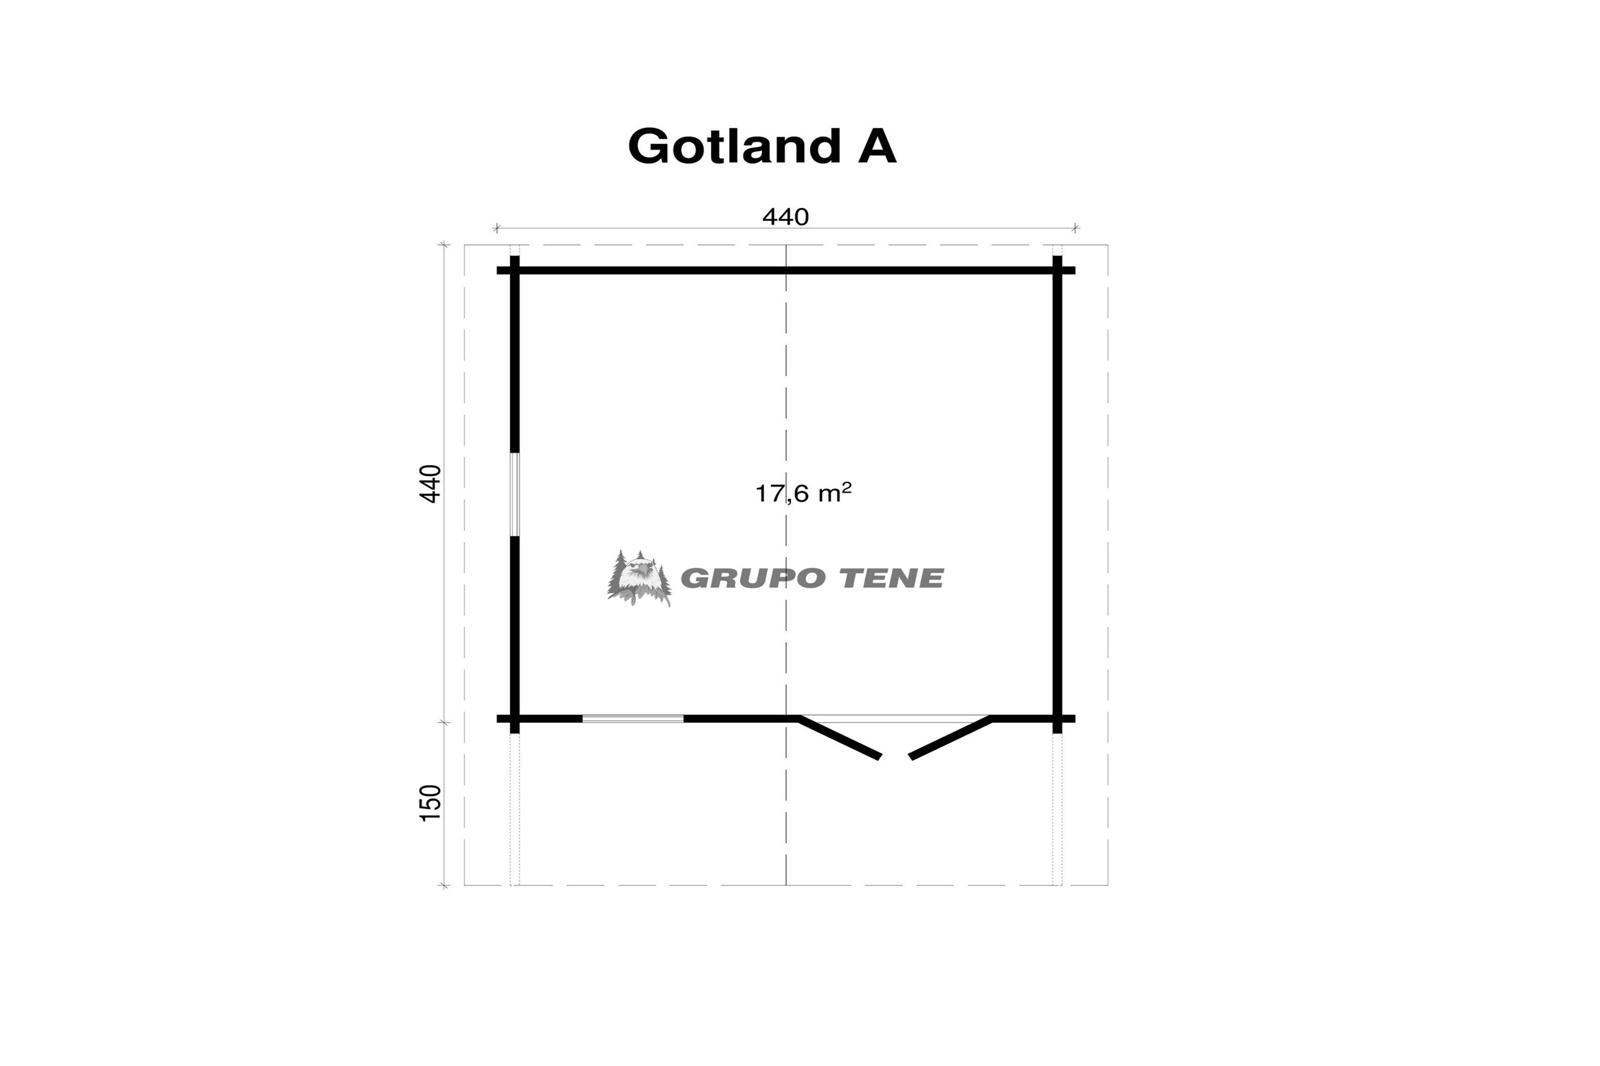 plano gotland a